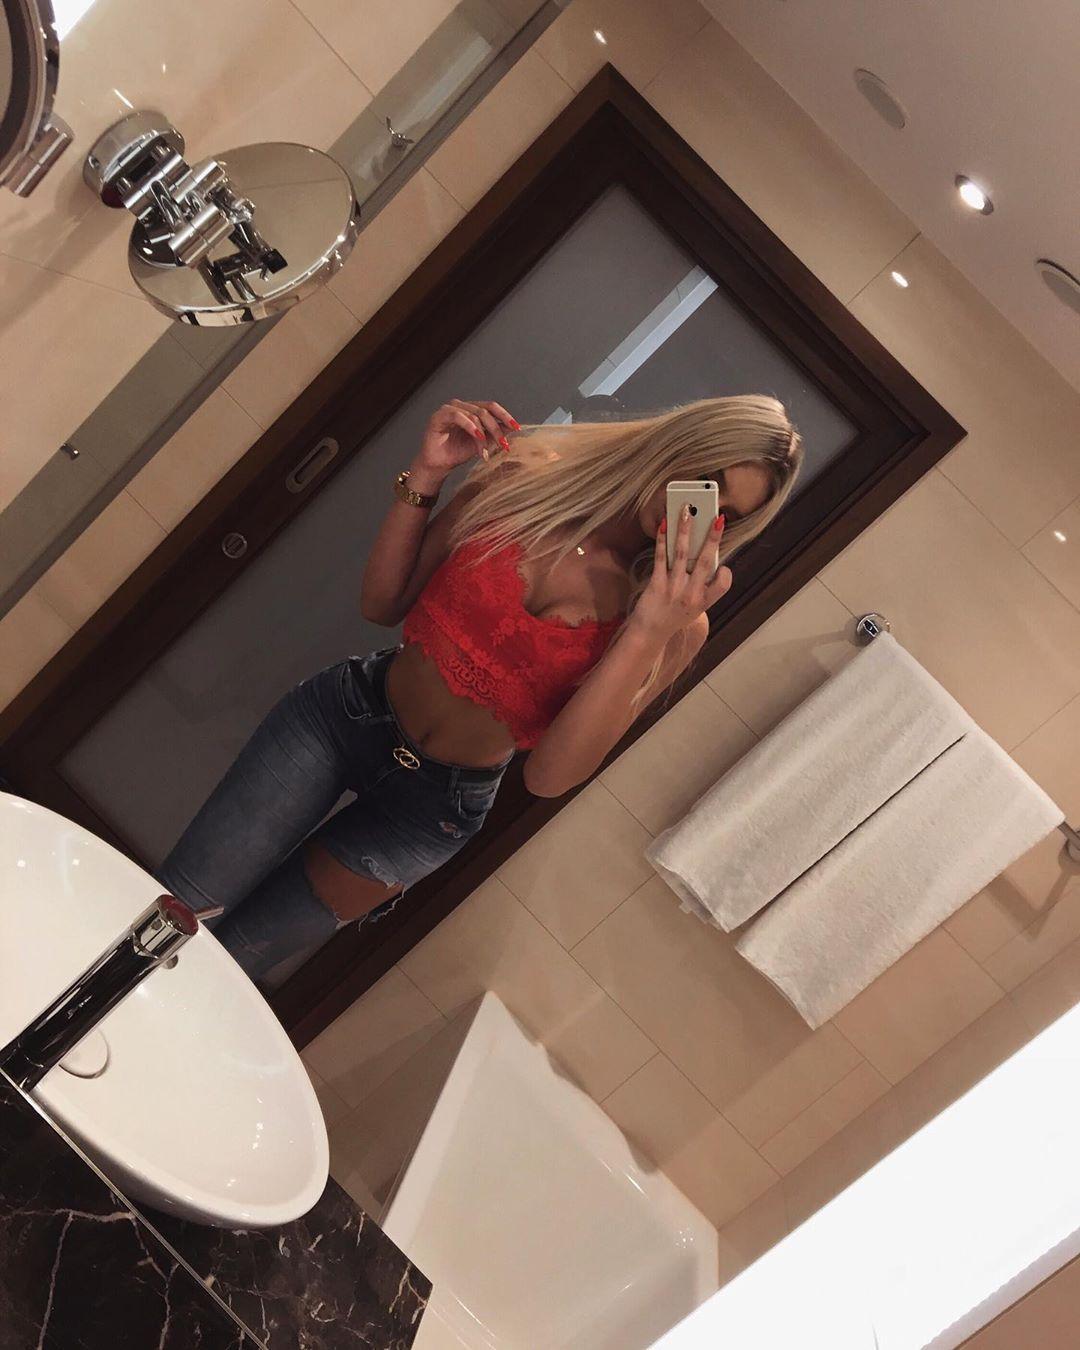 #polskadziewczyna #polishgirl #girl #girlpwr #blonde #blondegirl #blondehair #hair #longhair #outfit...